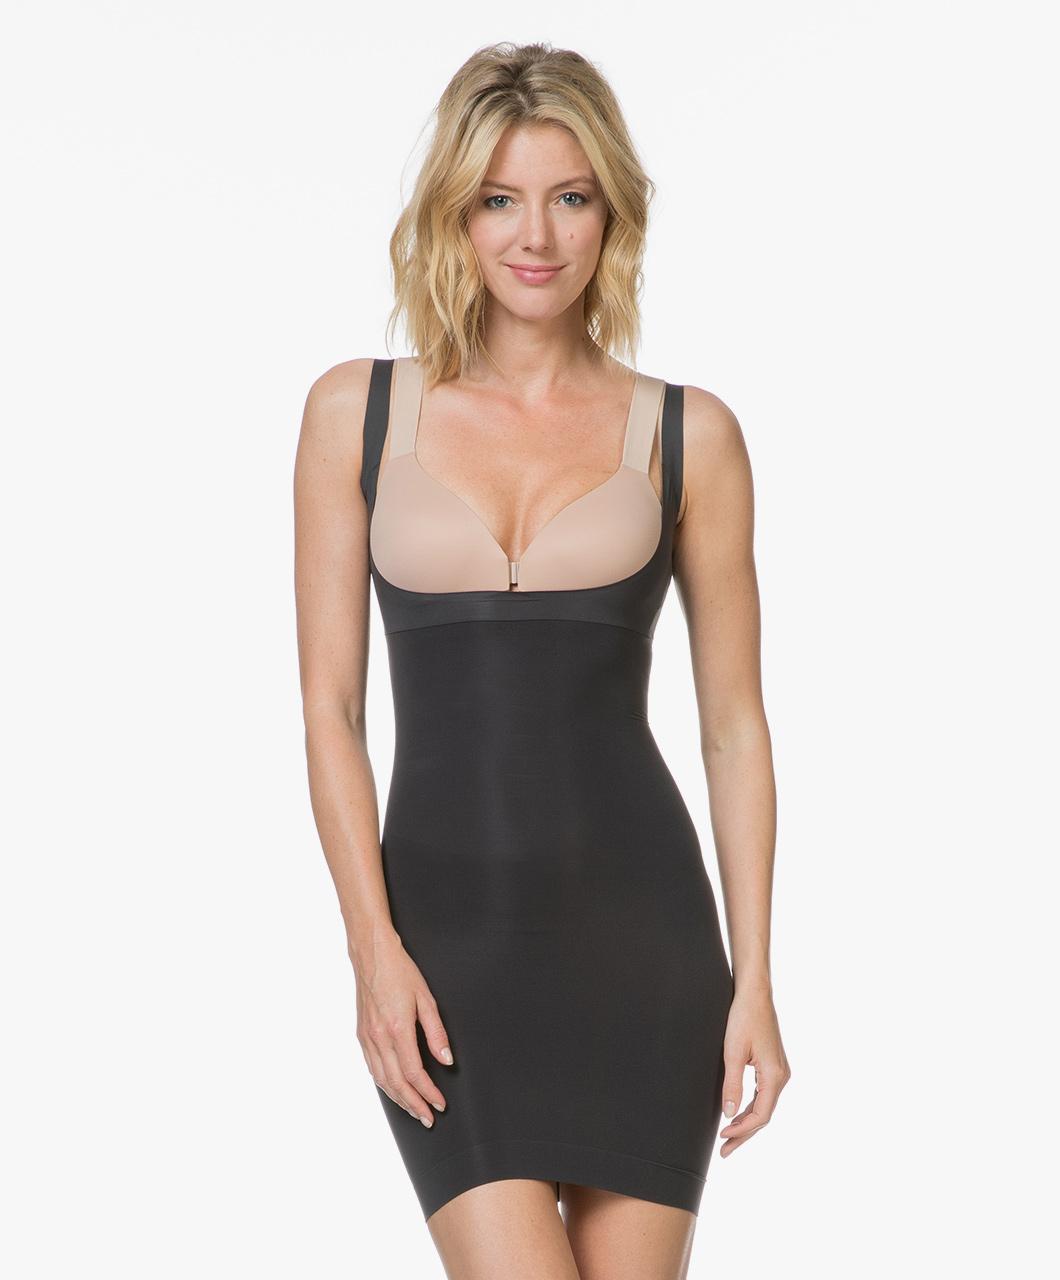 ca3a671f12a79 SPANX® Shape My Day Open-Bust Slip - Black - Spanx Shapewear